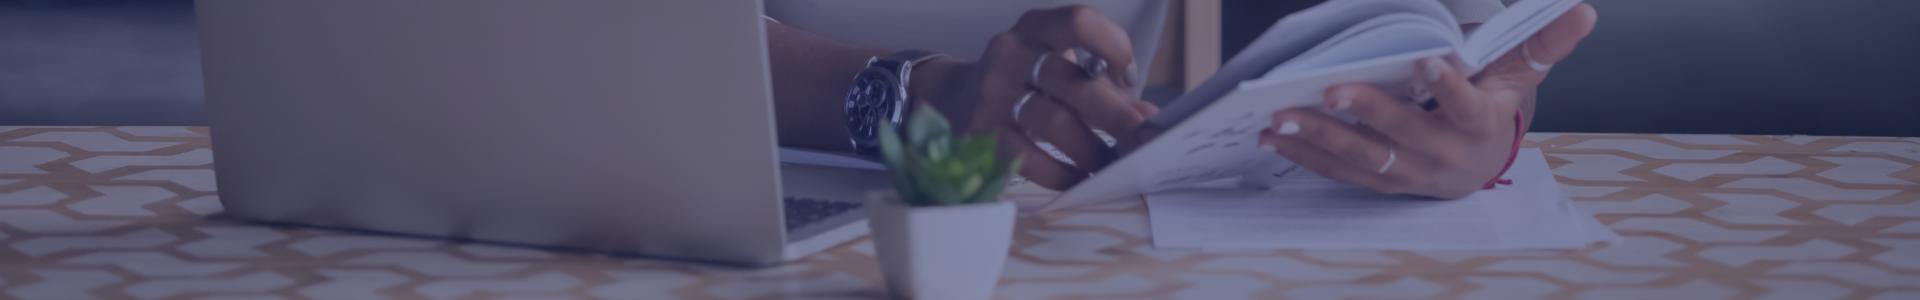 Partner Webinar 2020 - Page Header